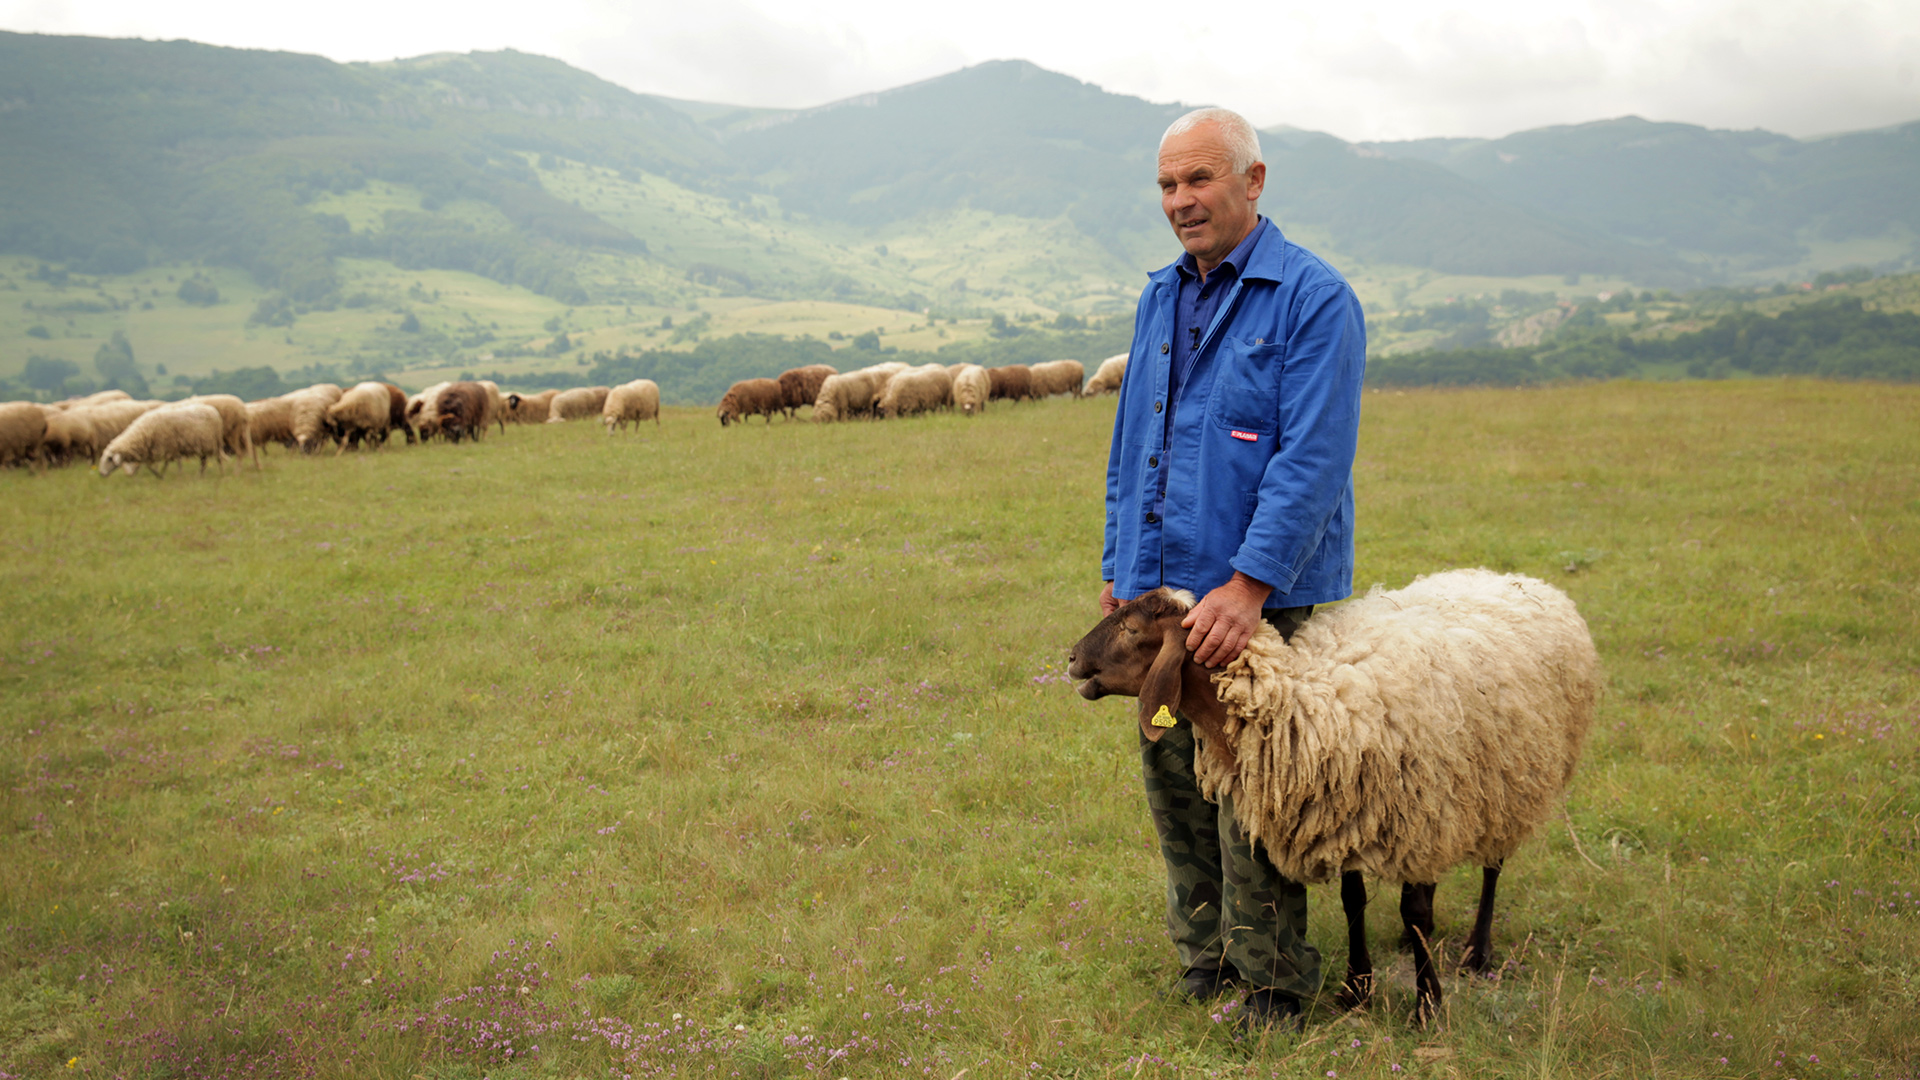 За Балкана и хората – Стоян Данаилов, фермер